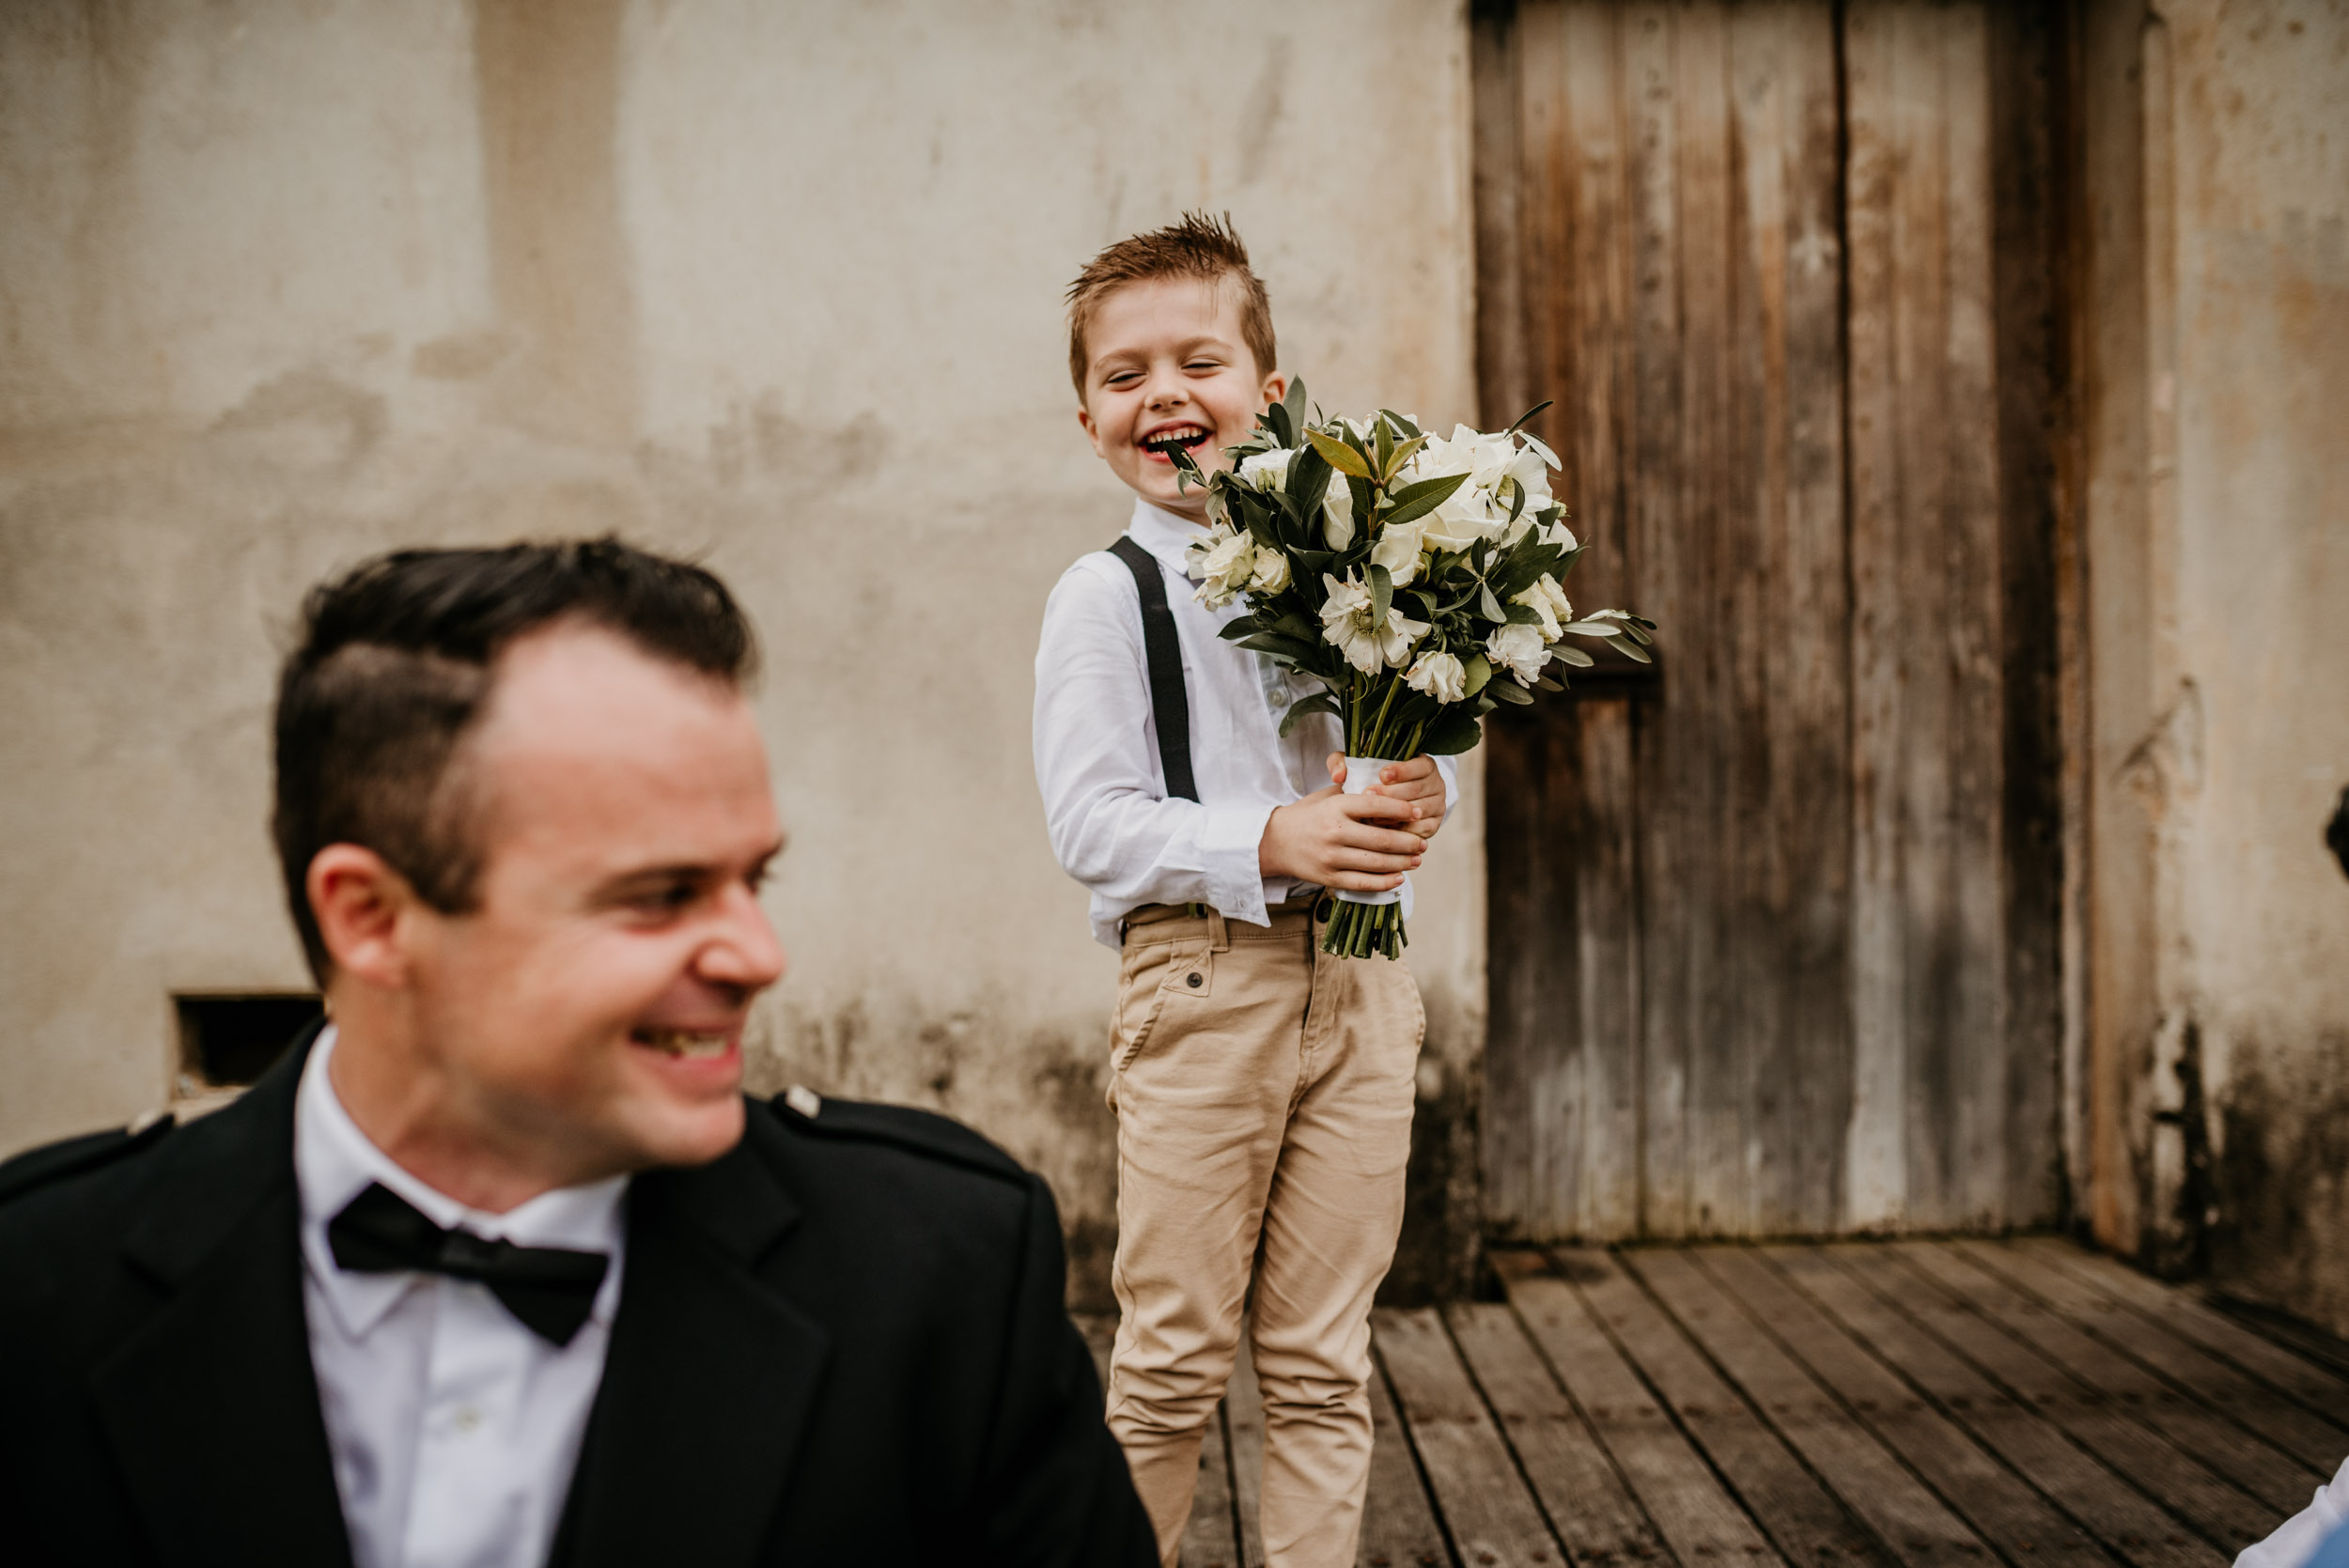 The Raw Photographer - Cairns and Port Douglas Wedding Photographer - Best of 2018-50.jpg